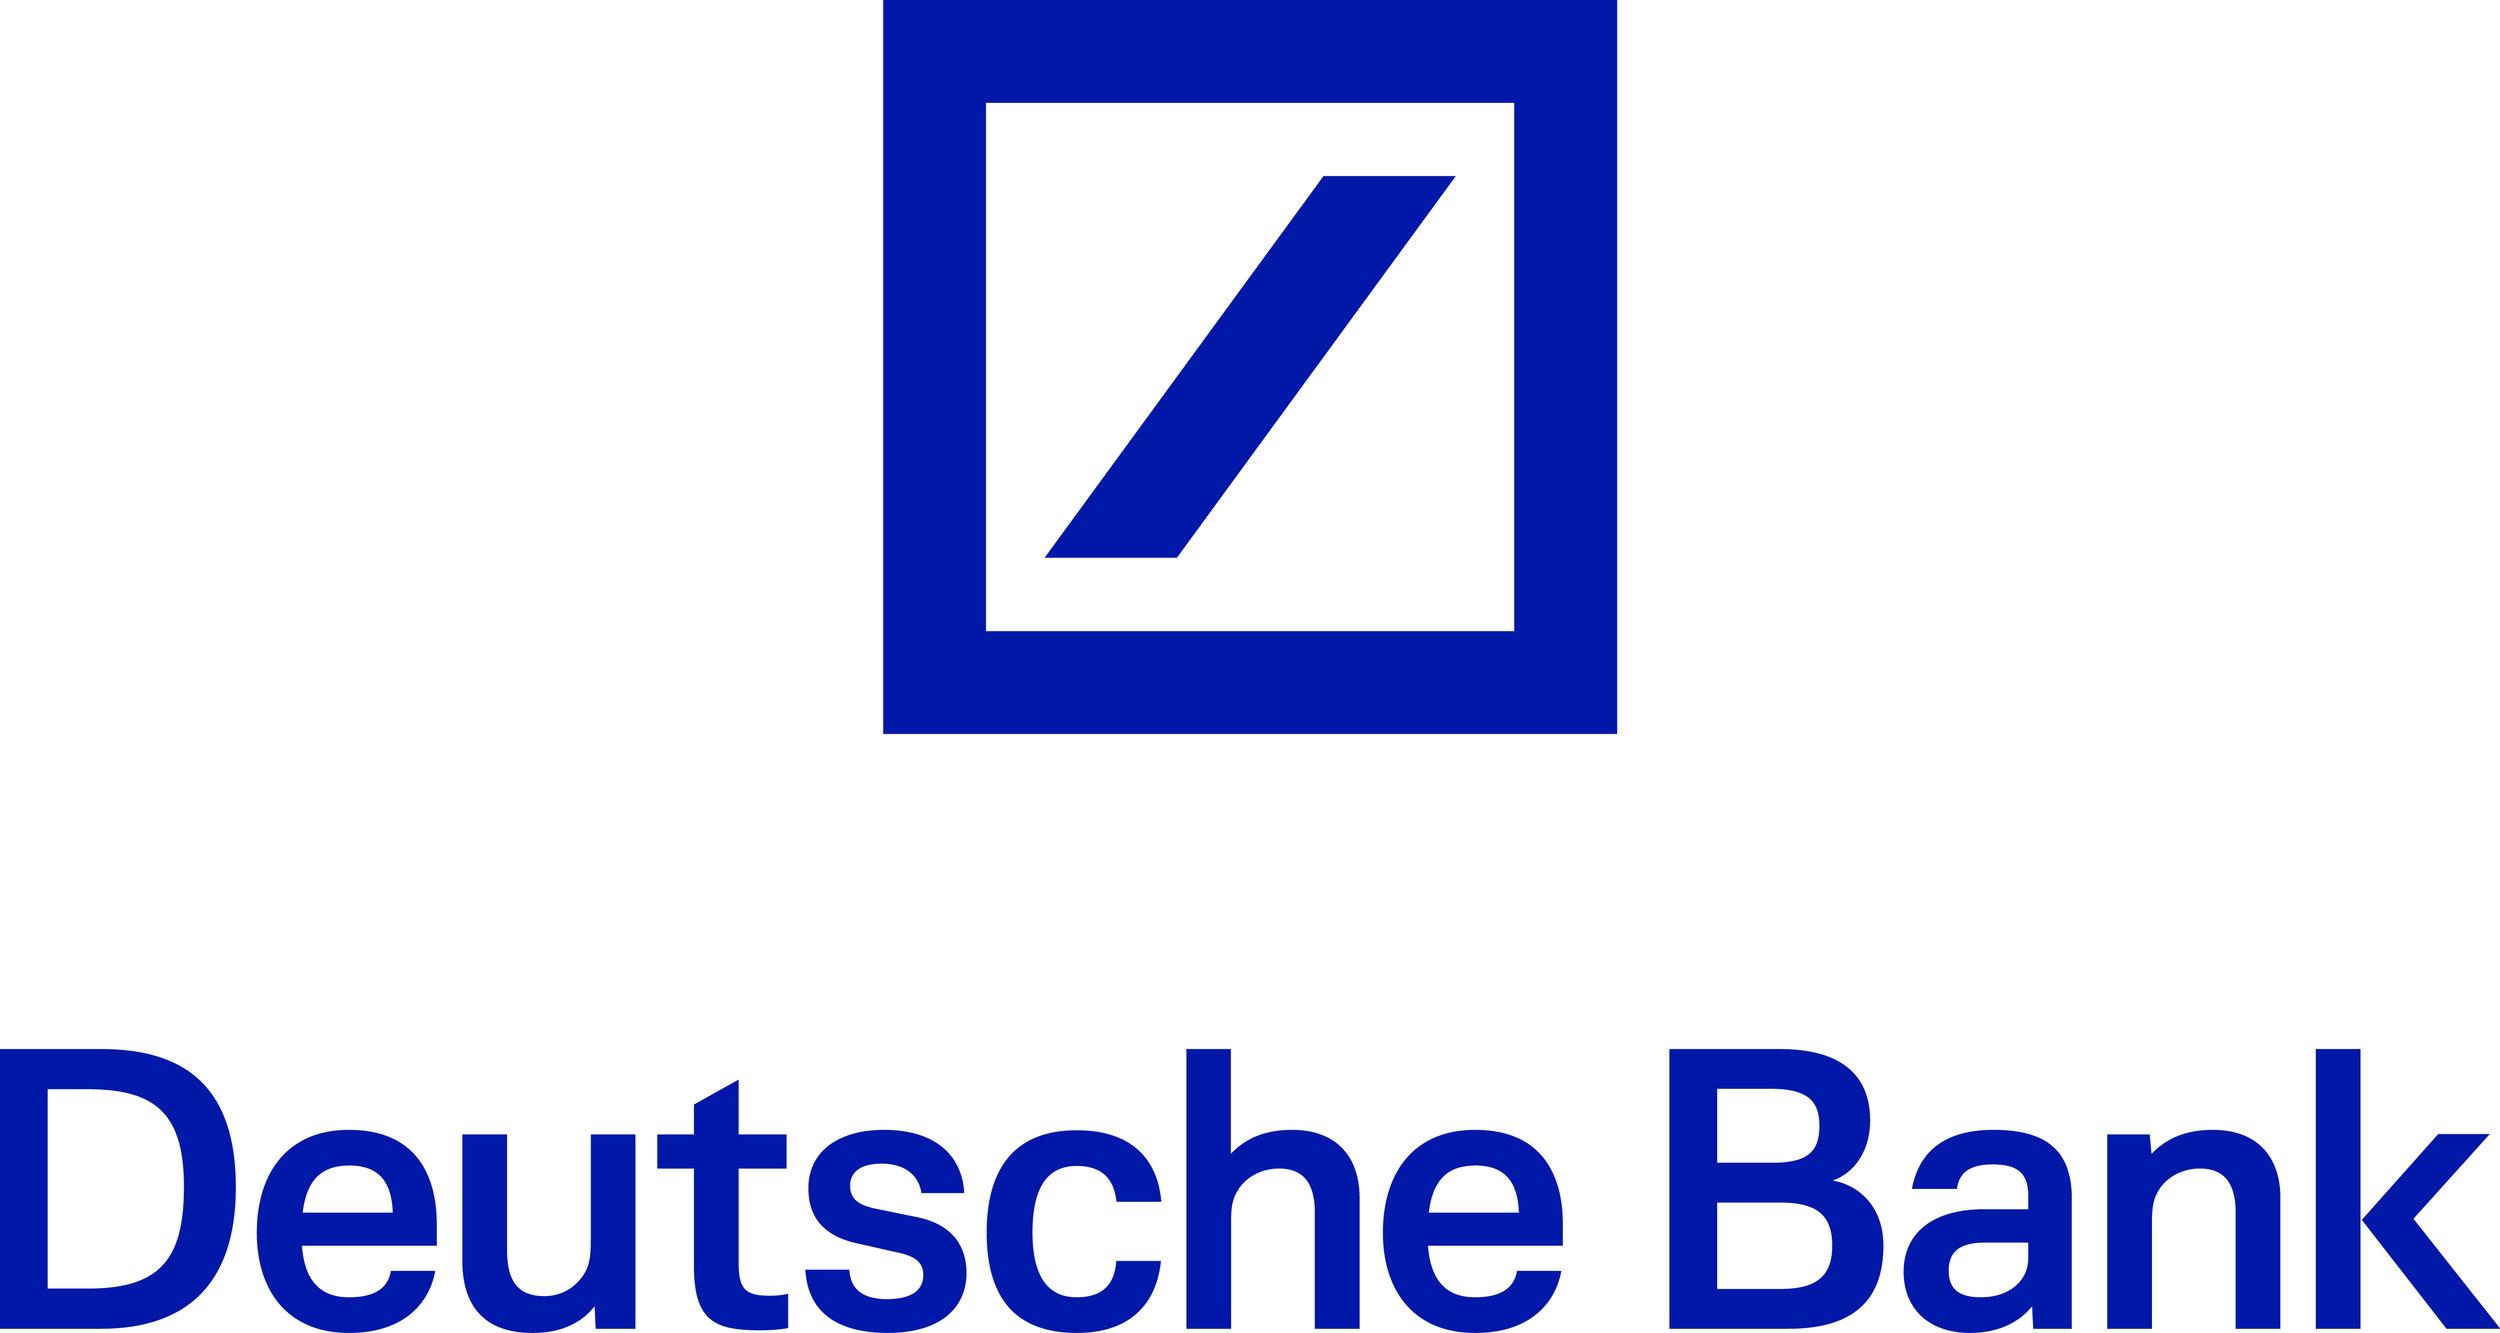 Deutsche-Bank-logo.jpeg